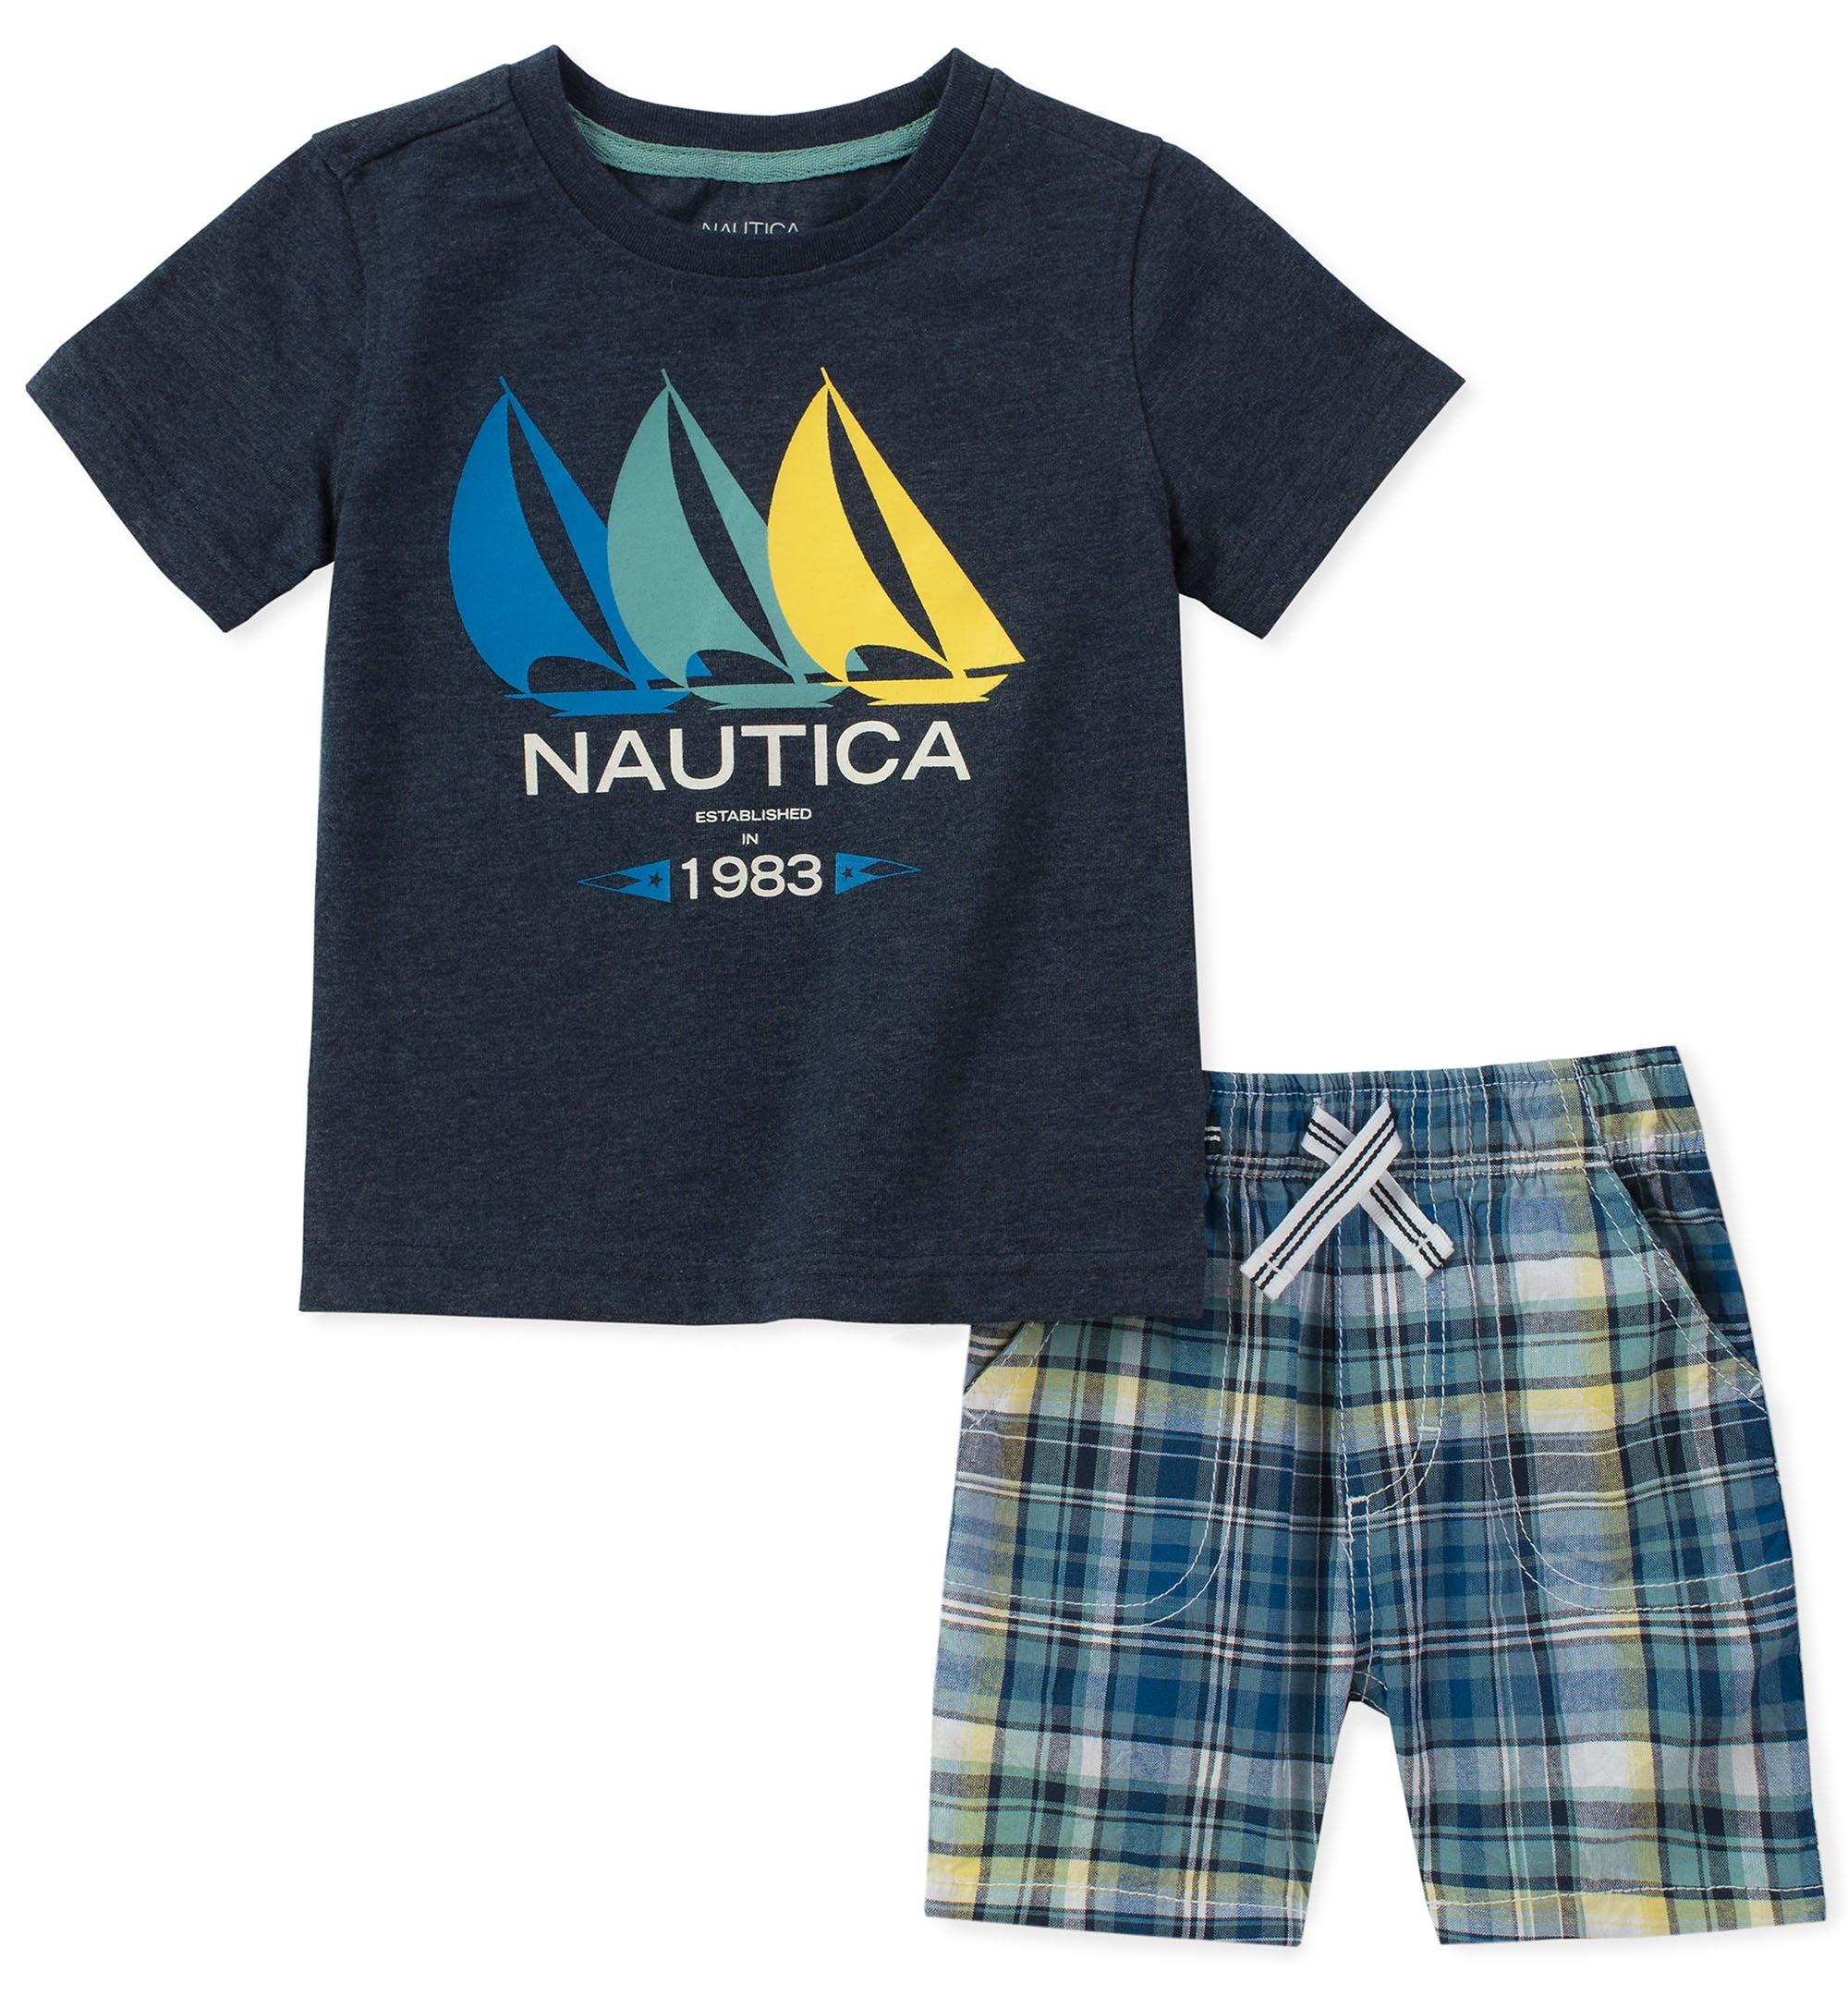 Nautica Little Boys' Tee with Shorts, Navy, 6